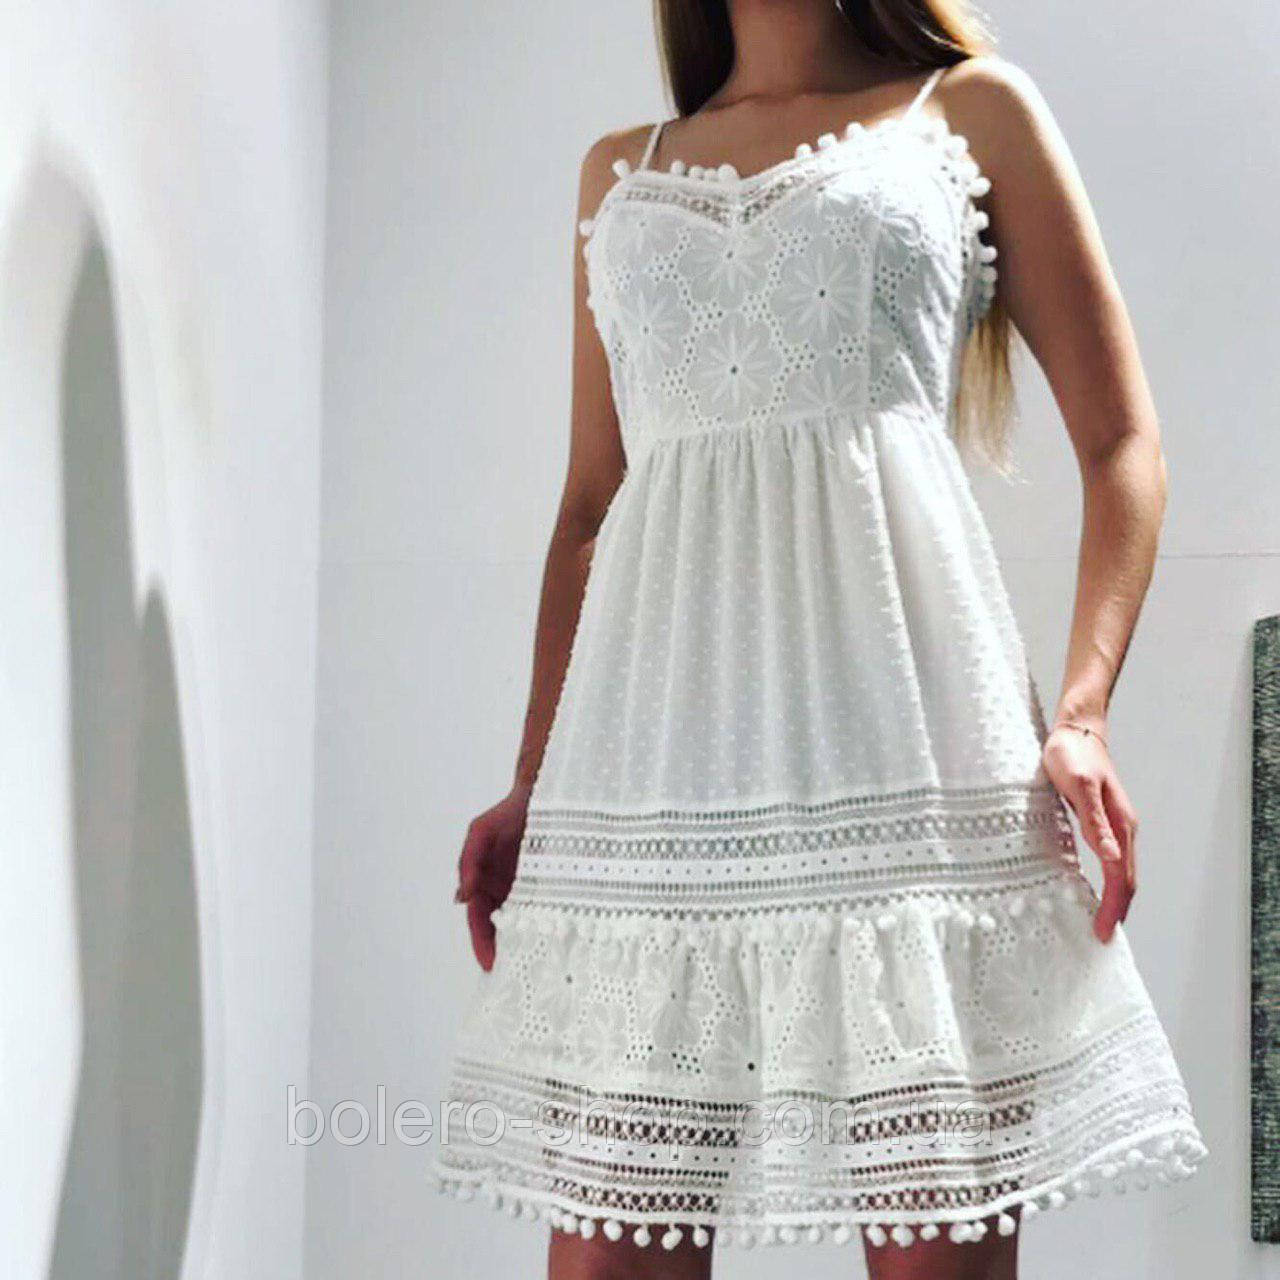 Женское платье-сарафан хлопок ажурный Италия